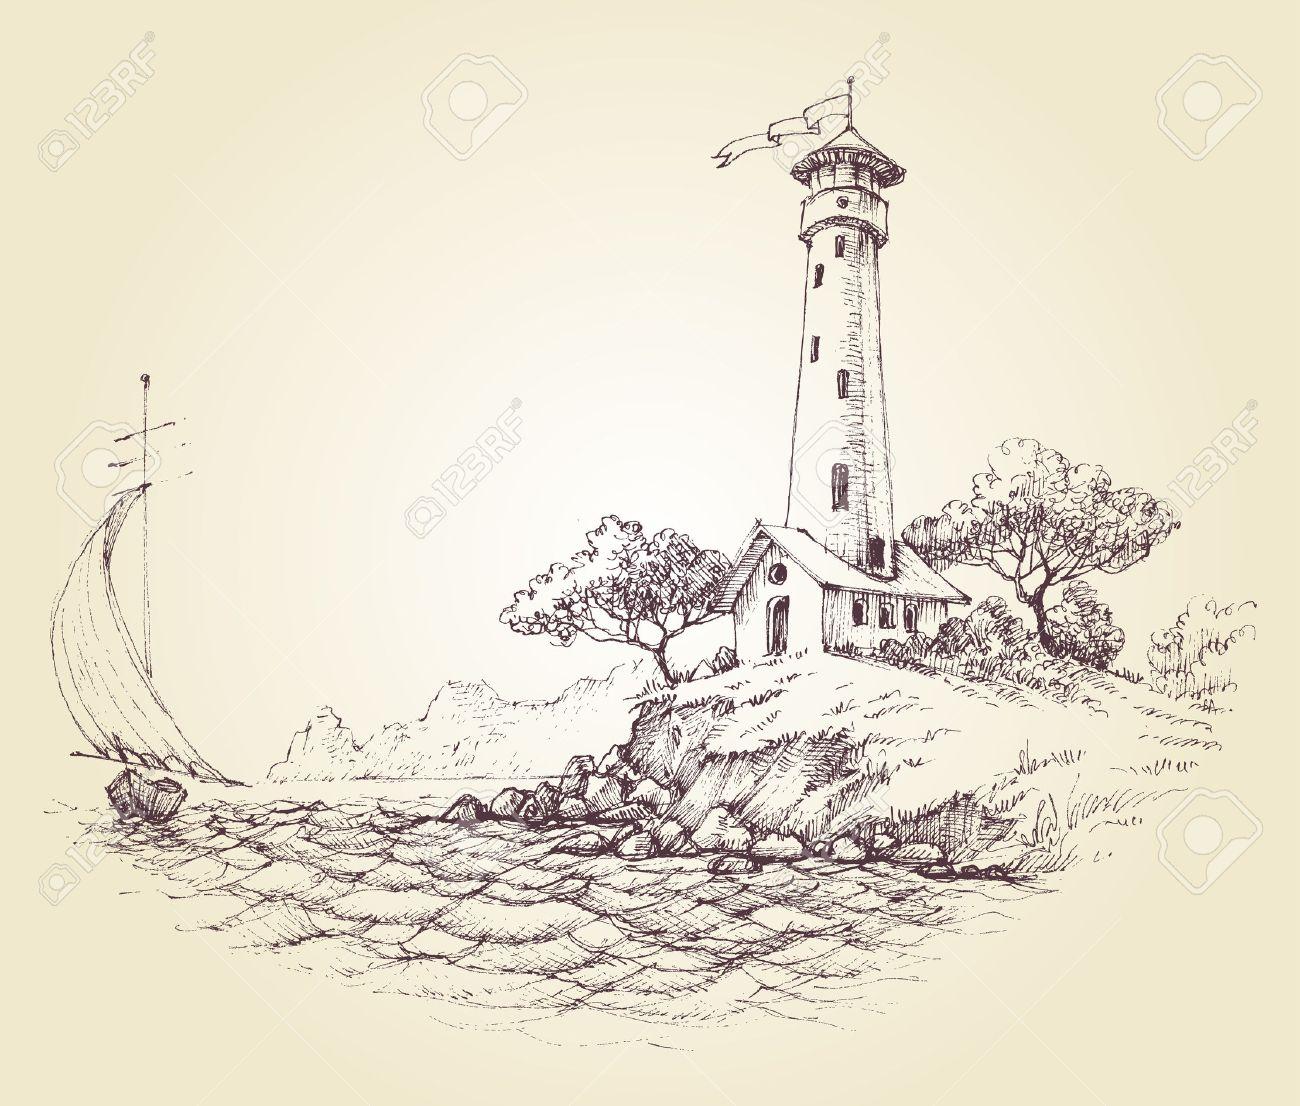 phare dessin Phare de dessin vectoriel paysage marin et de voilier en mer